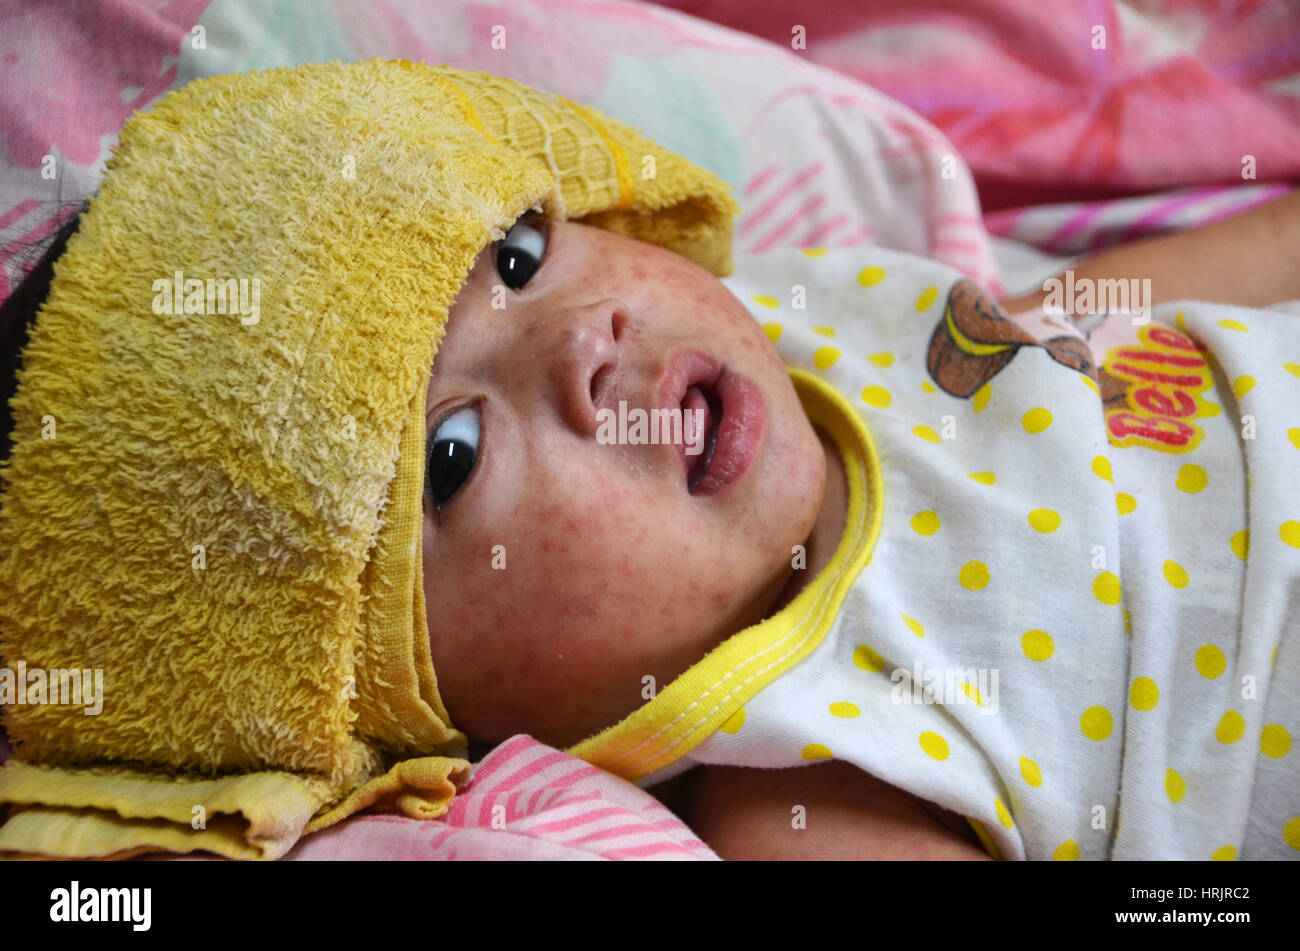 Bebé con sarampión erupción, 2014 Imagen De Stock